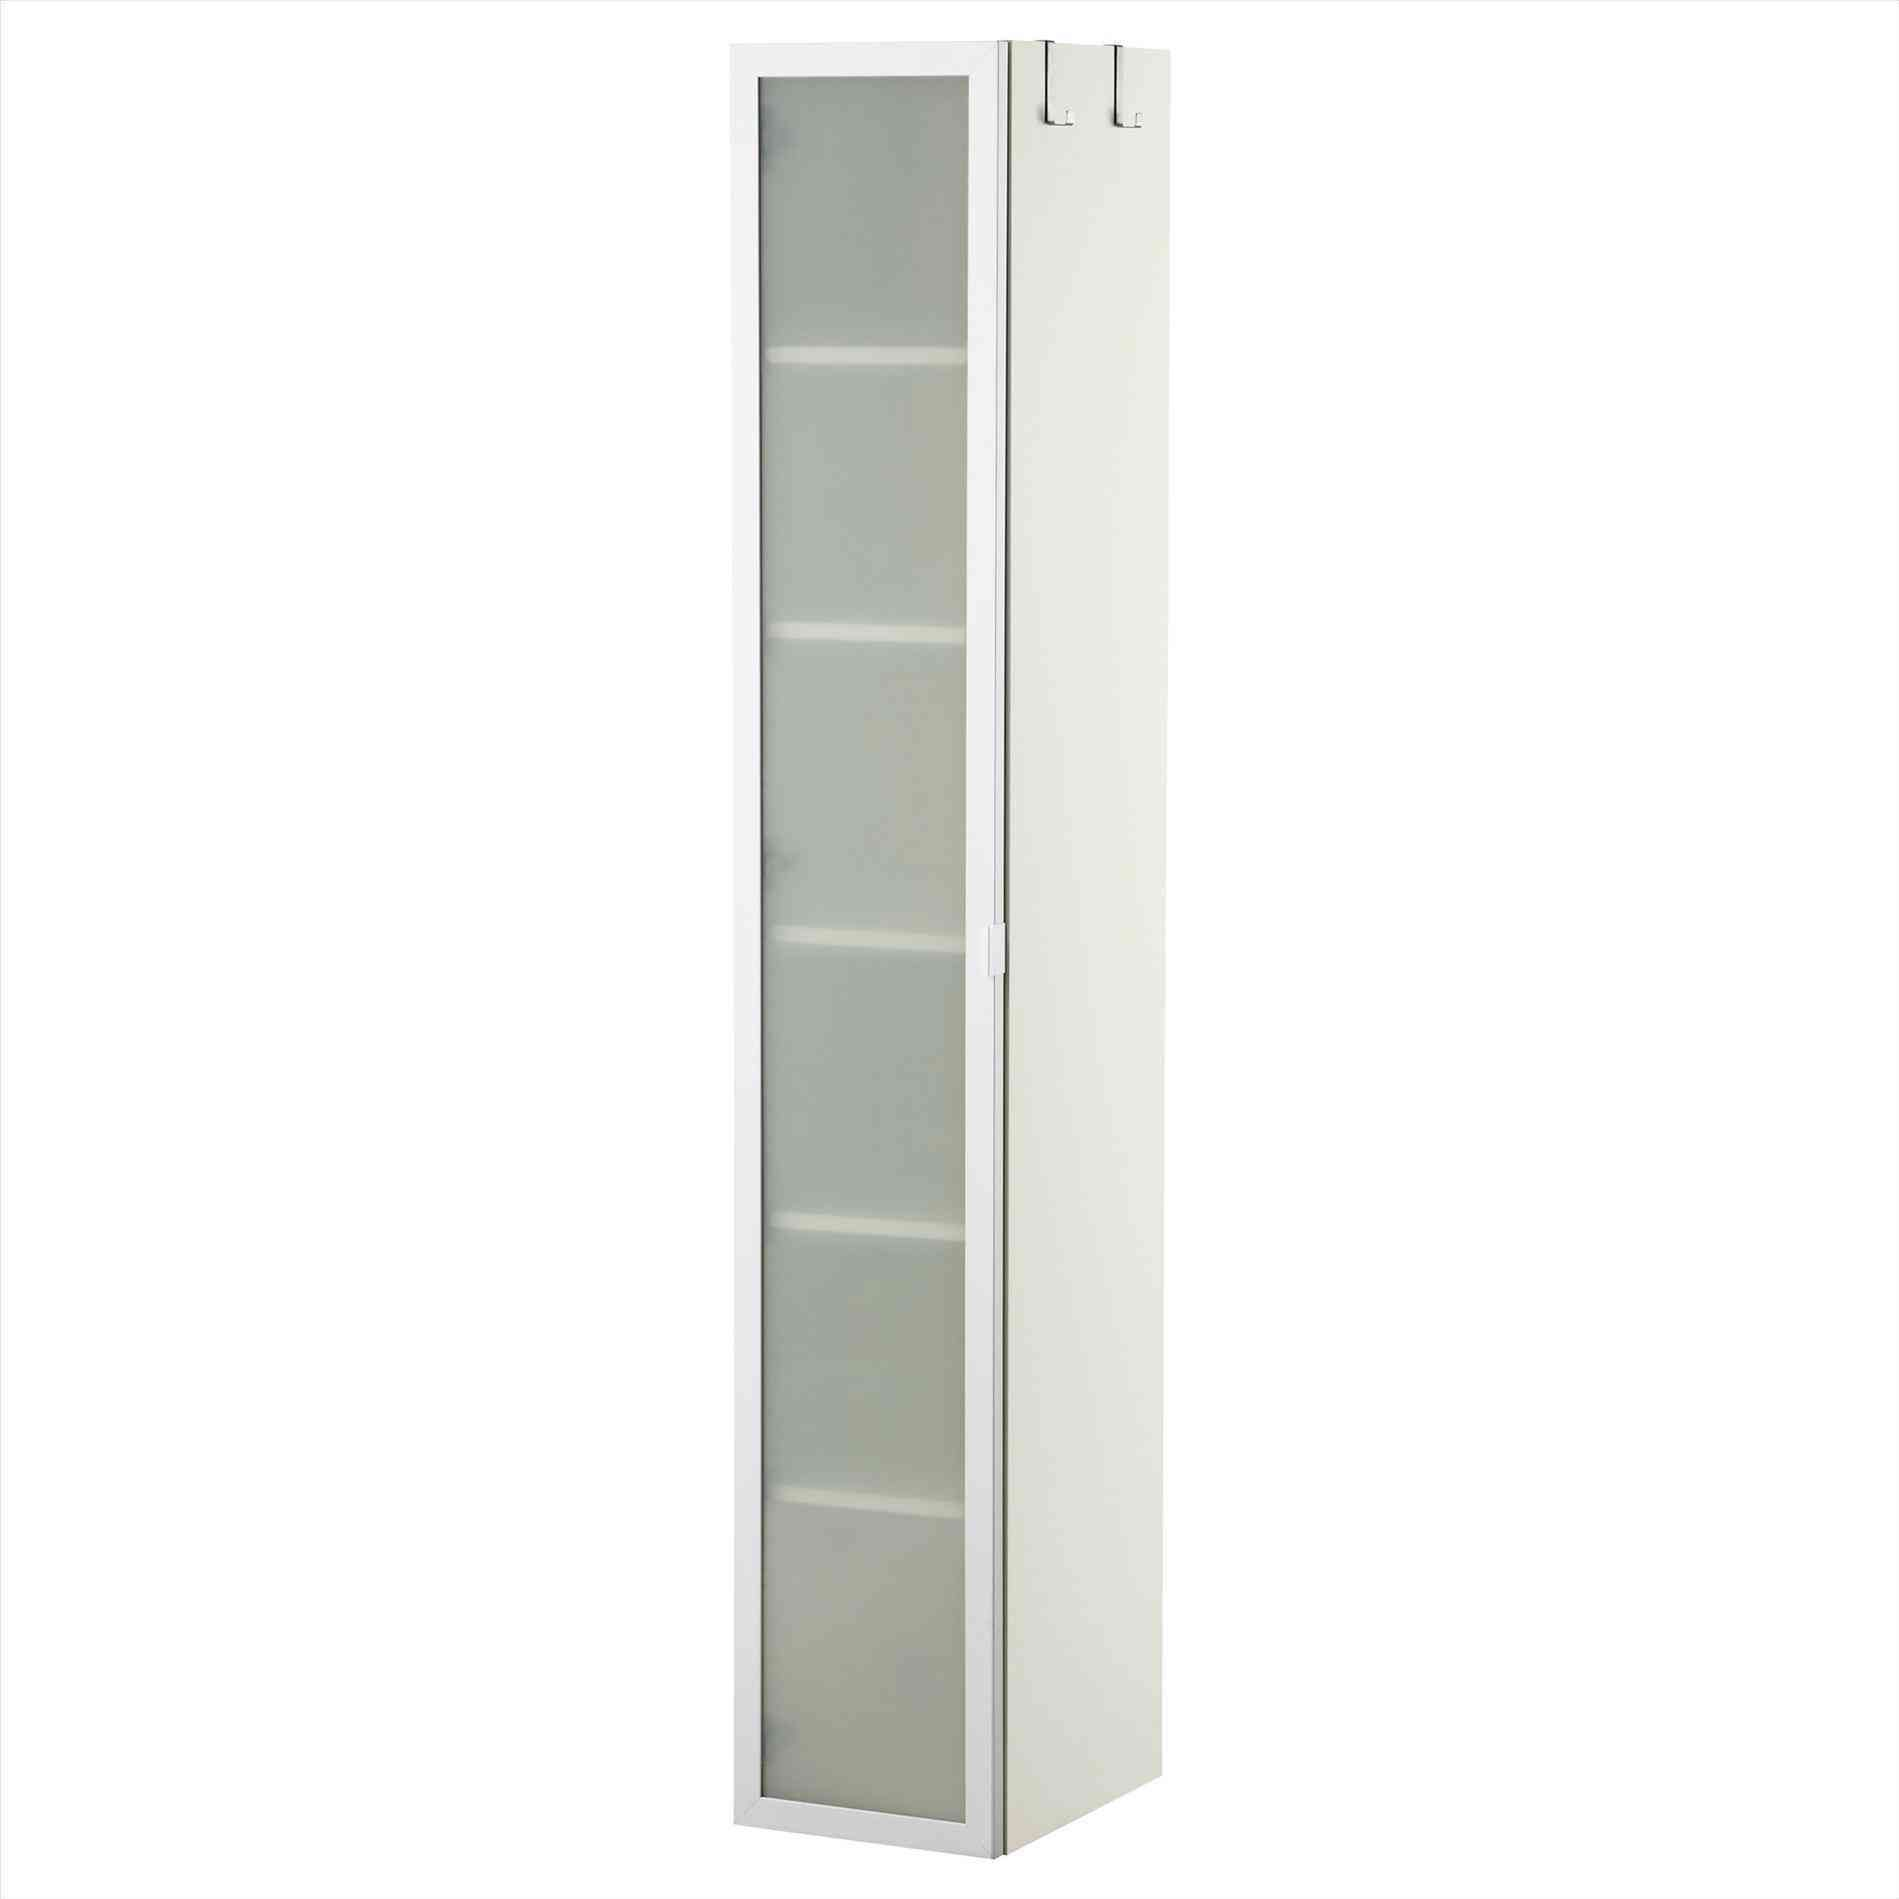 New Post tall skinny bathroom cabinet | LivingRooms | Pinterest ...